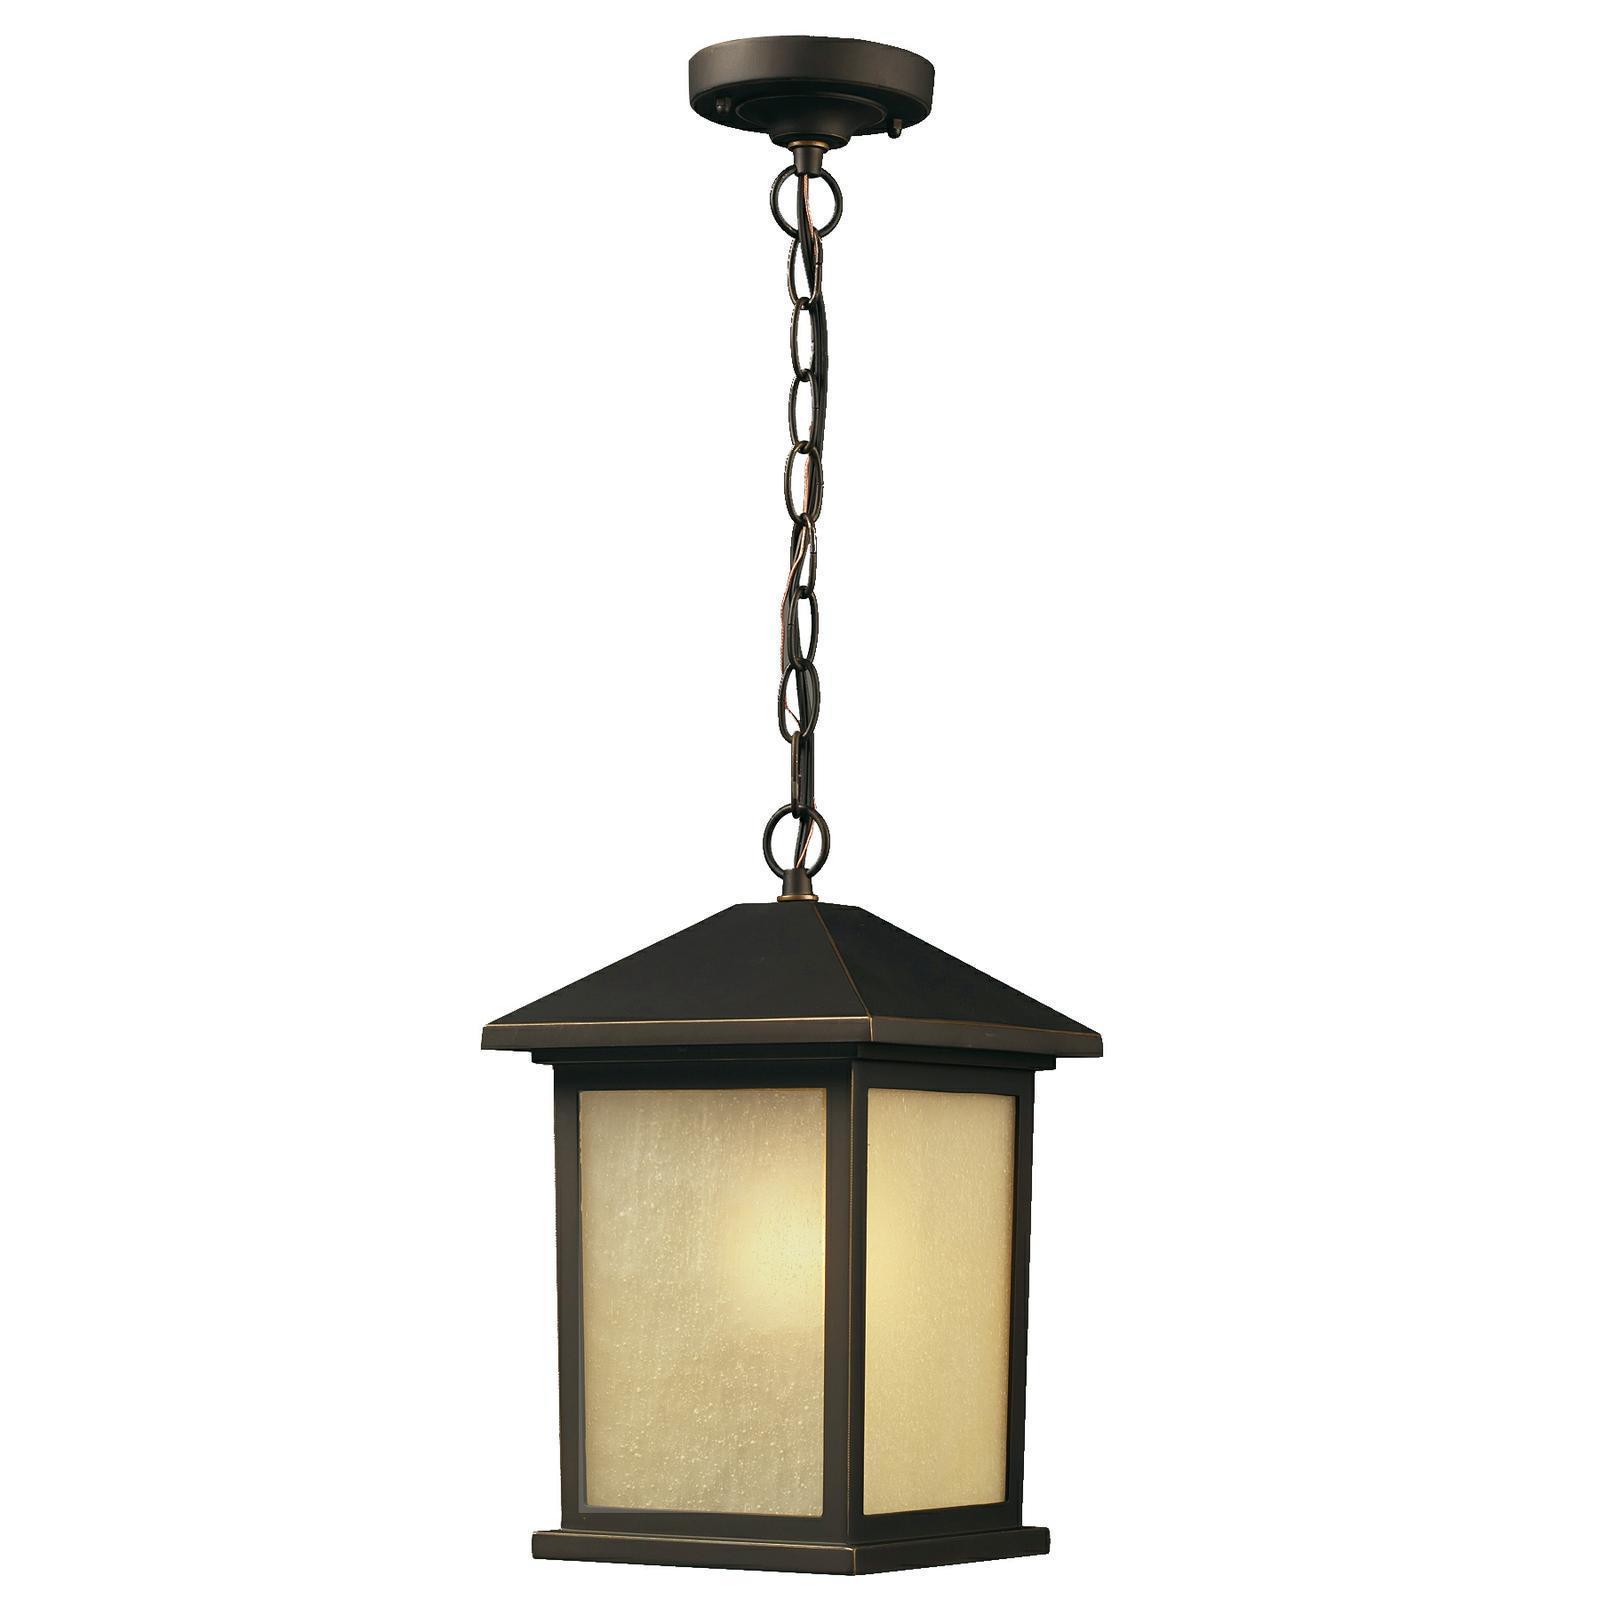 Holbrook 1-light Oil Rubbed Bronze Outdoor Light